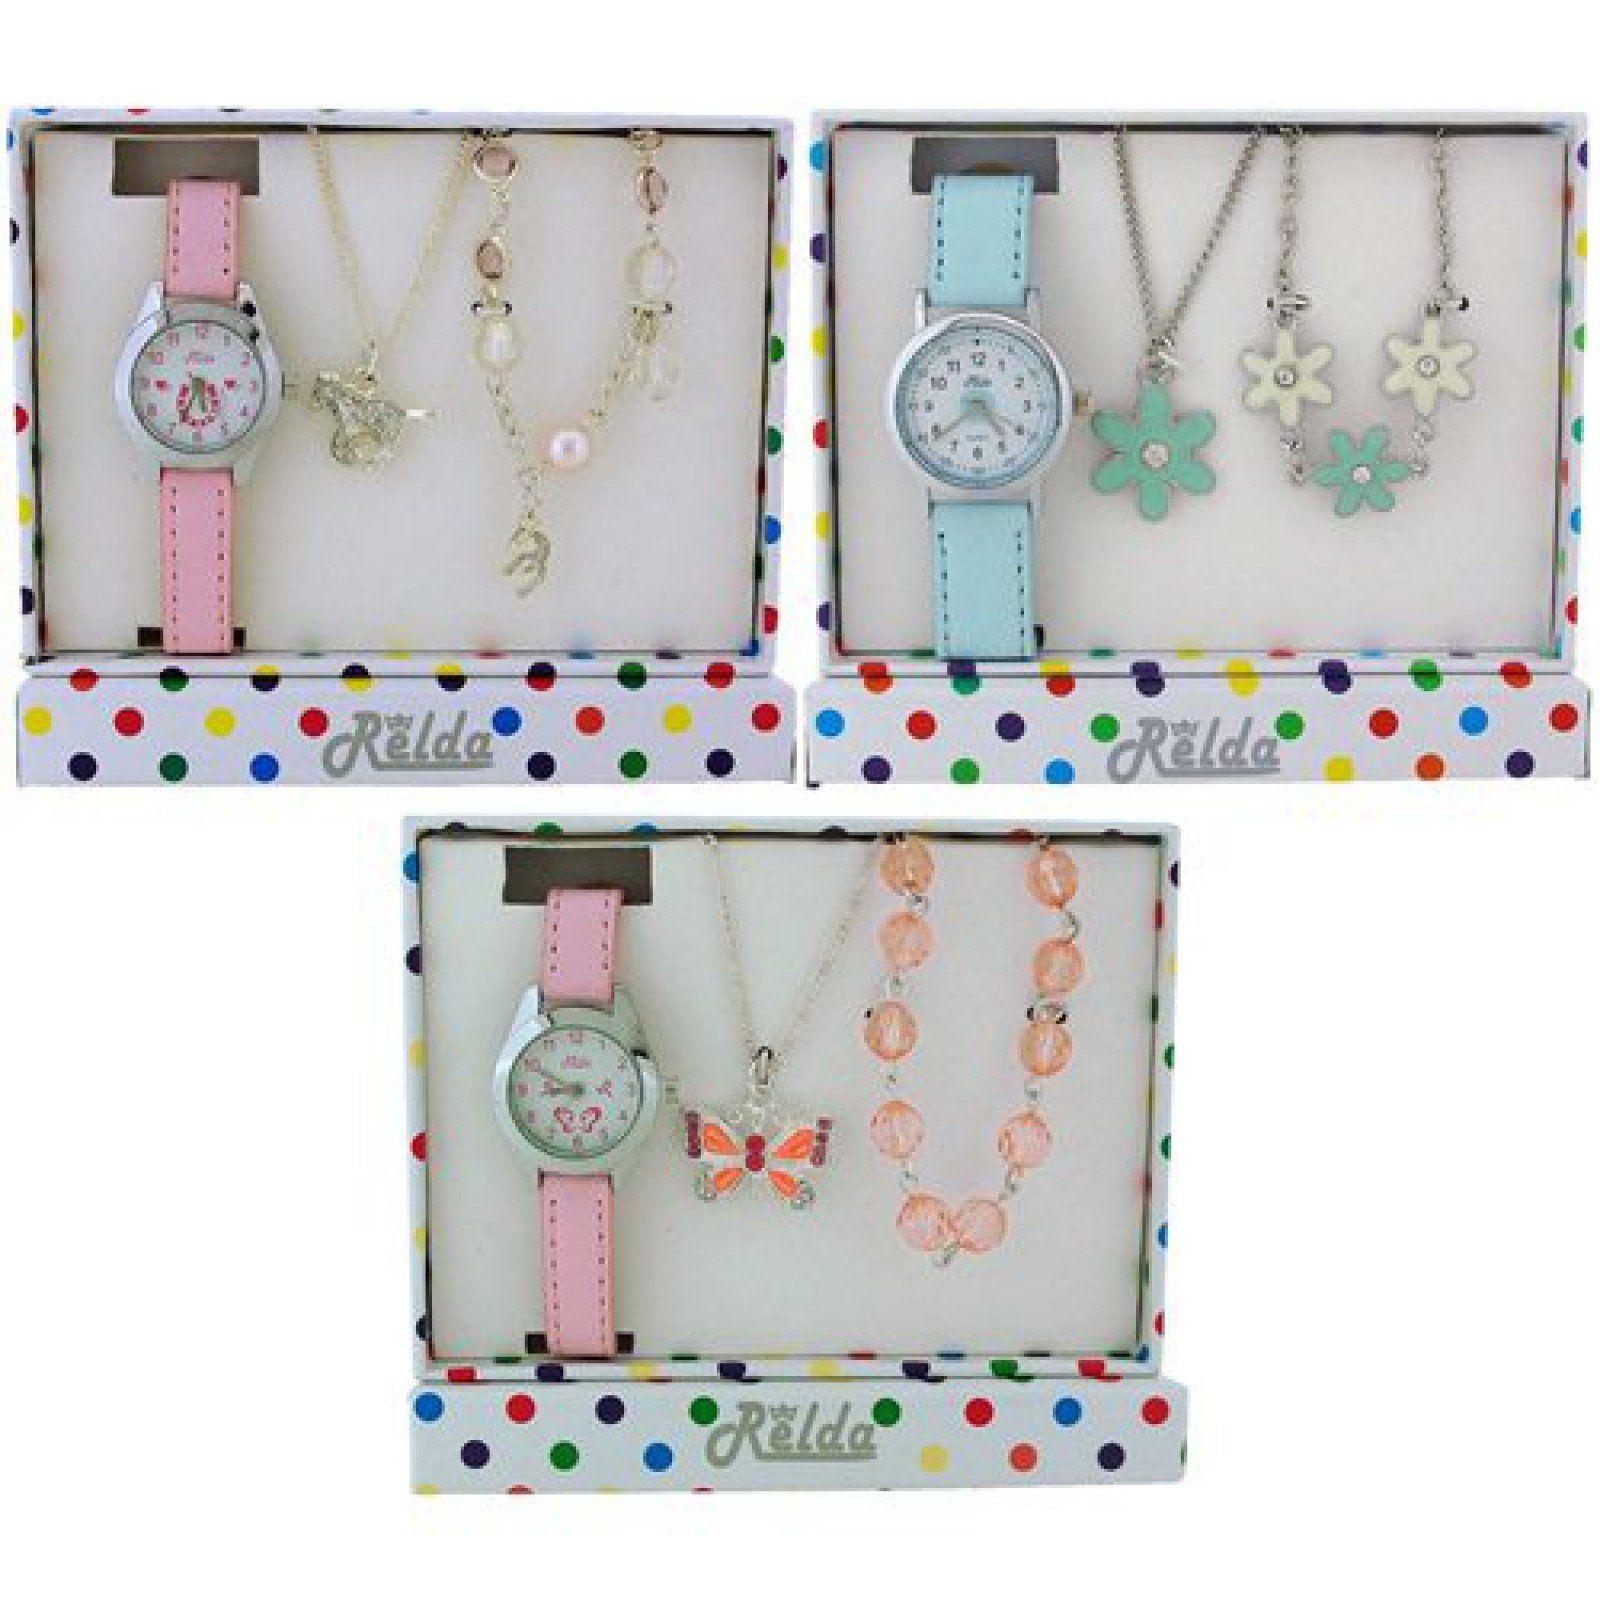 Relda kids watch u jewellery gift set pack of designs rel